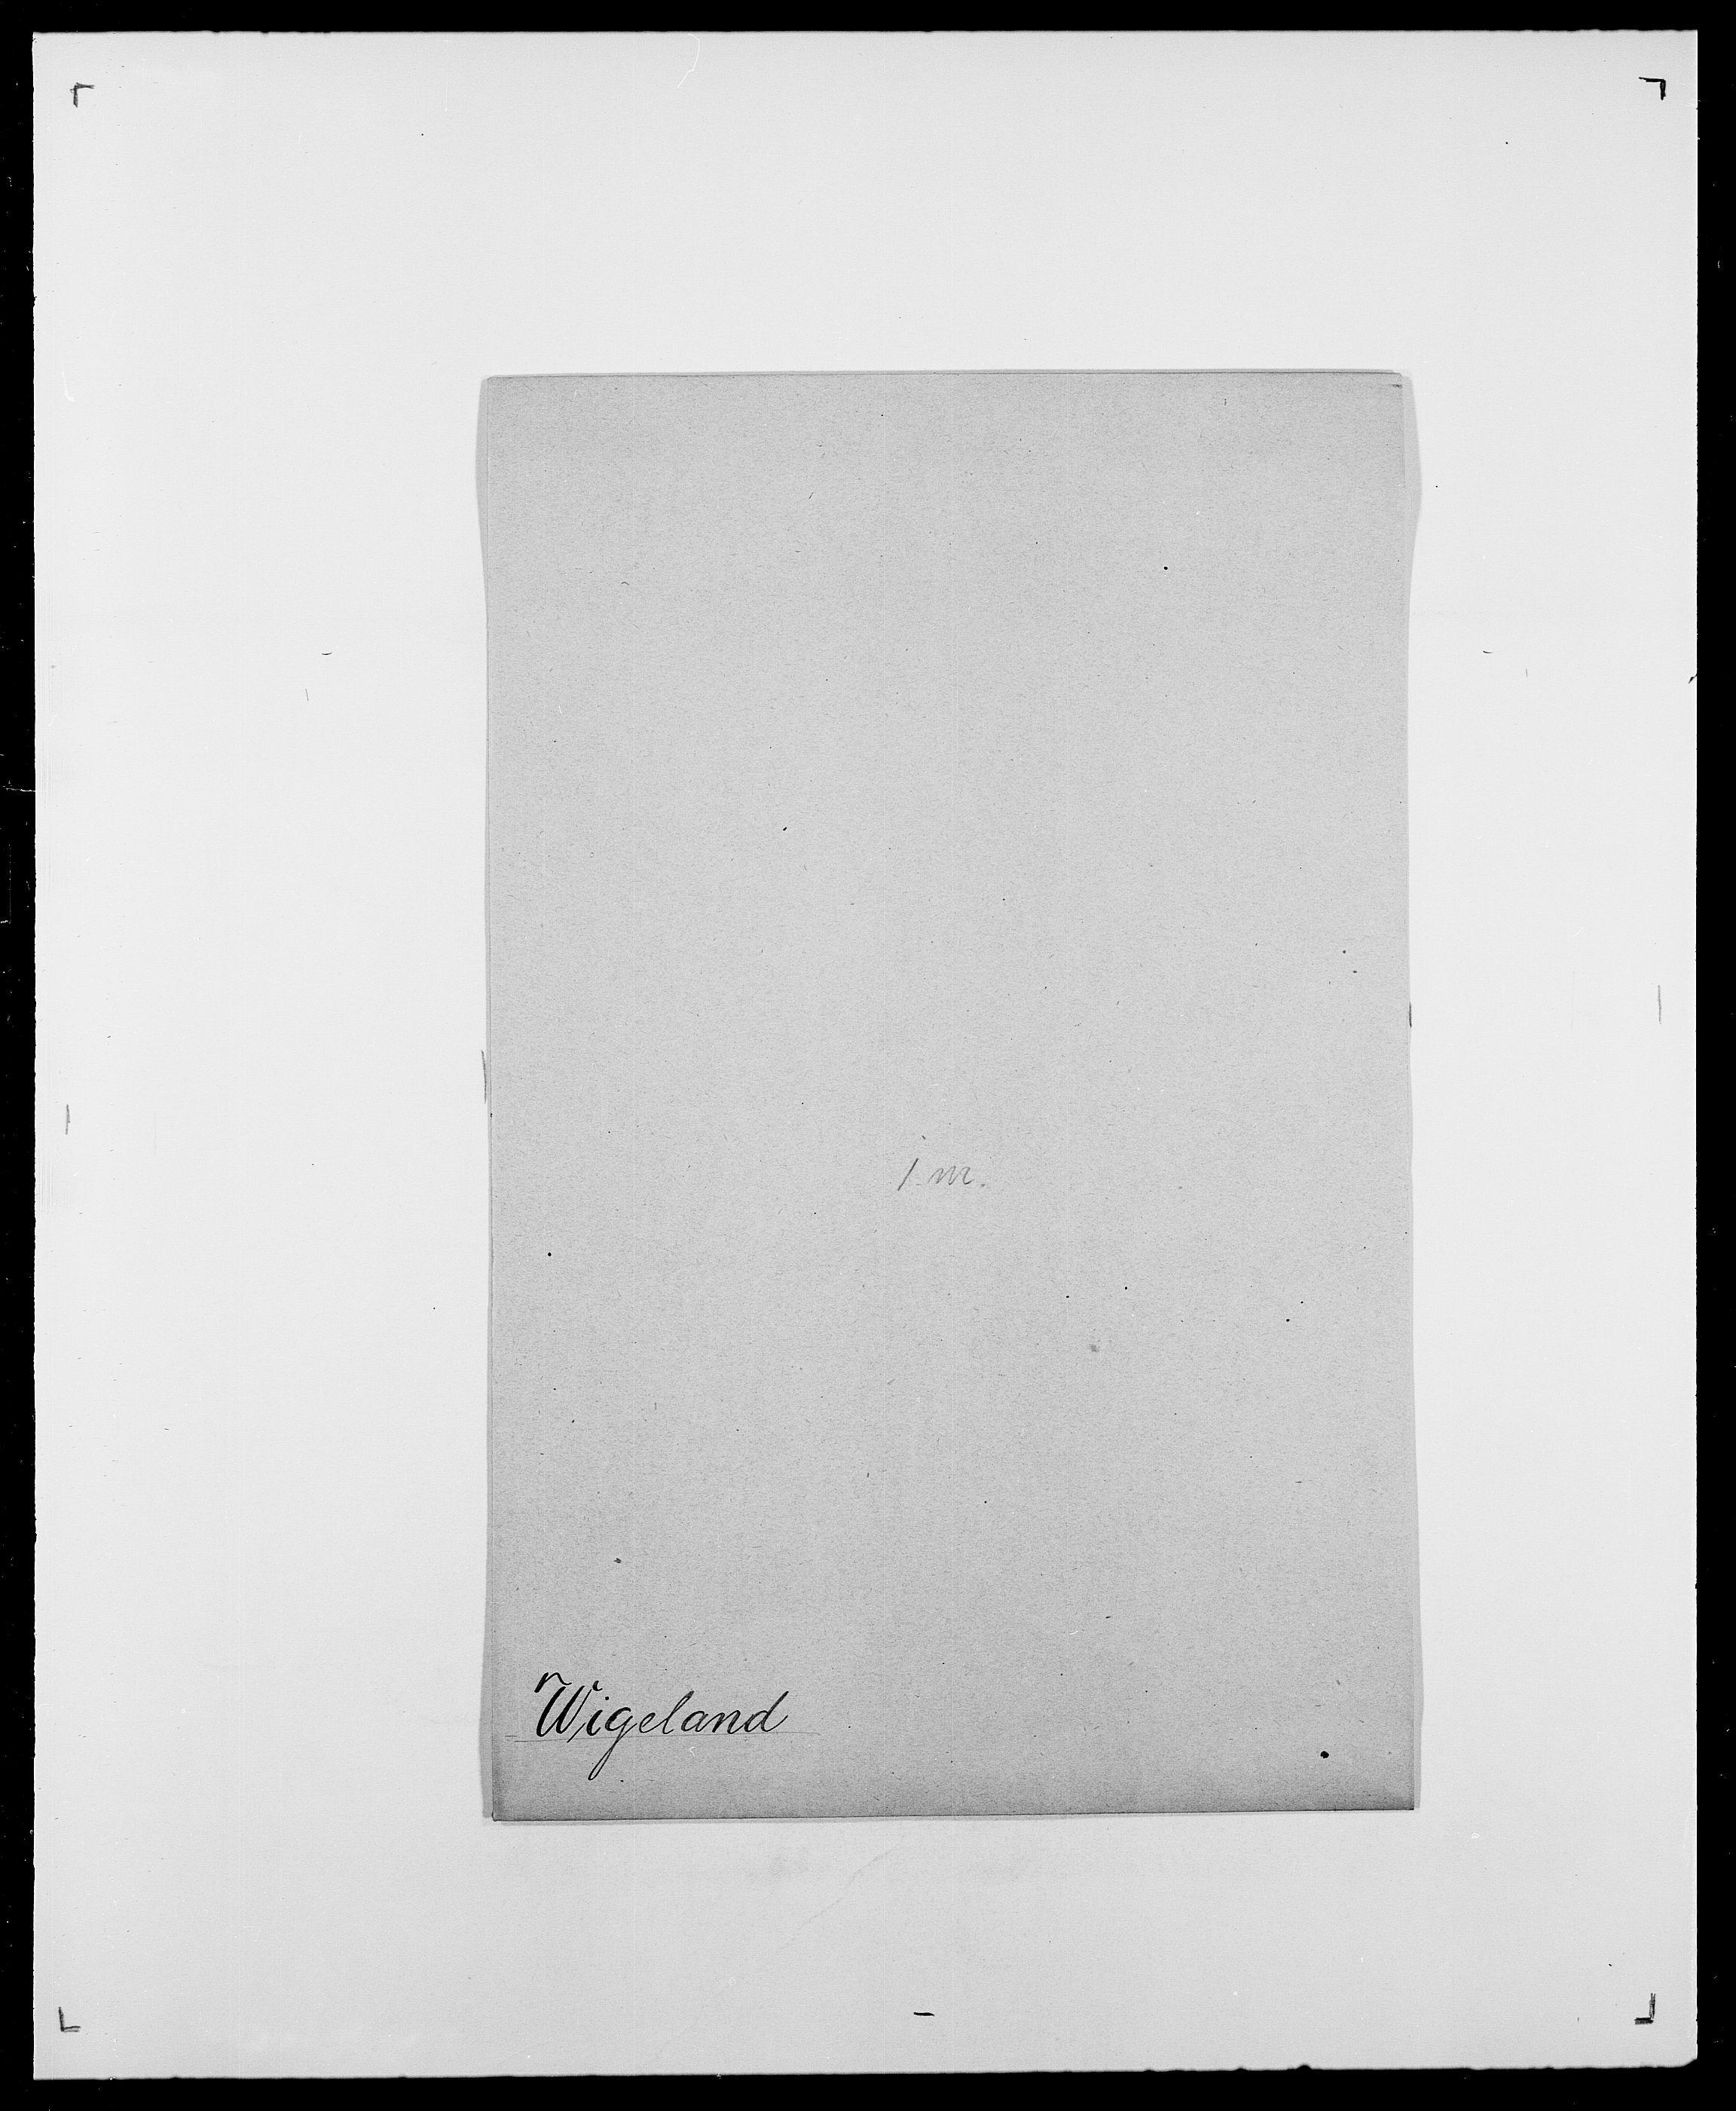 SAO, Delgobe, Charles Antoine - samling, D/Da/L0041: Vemmestad - Viker, s. 686